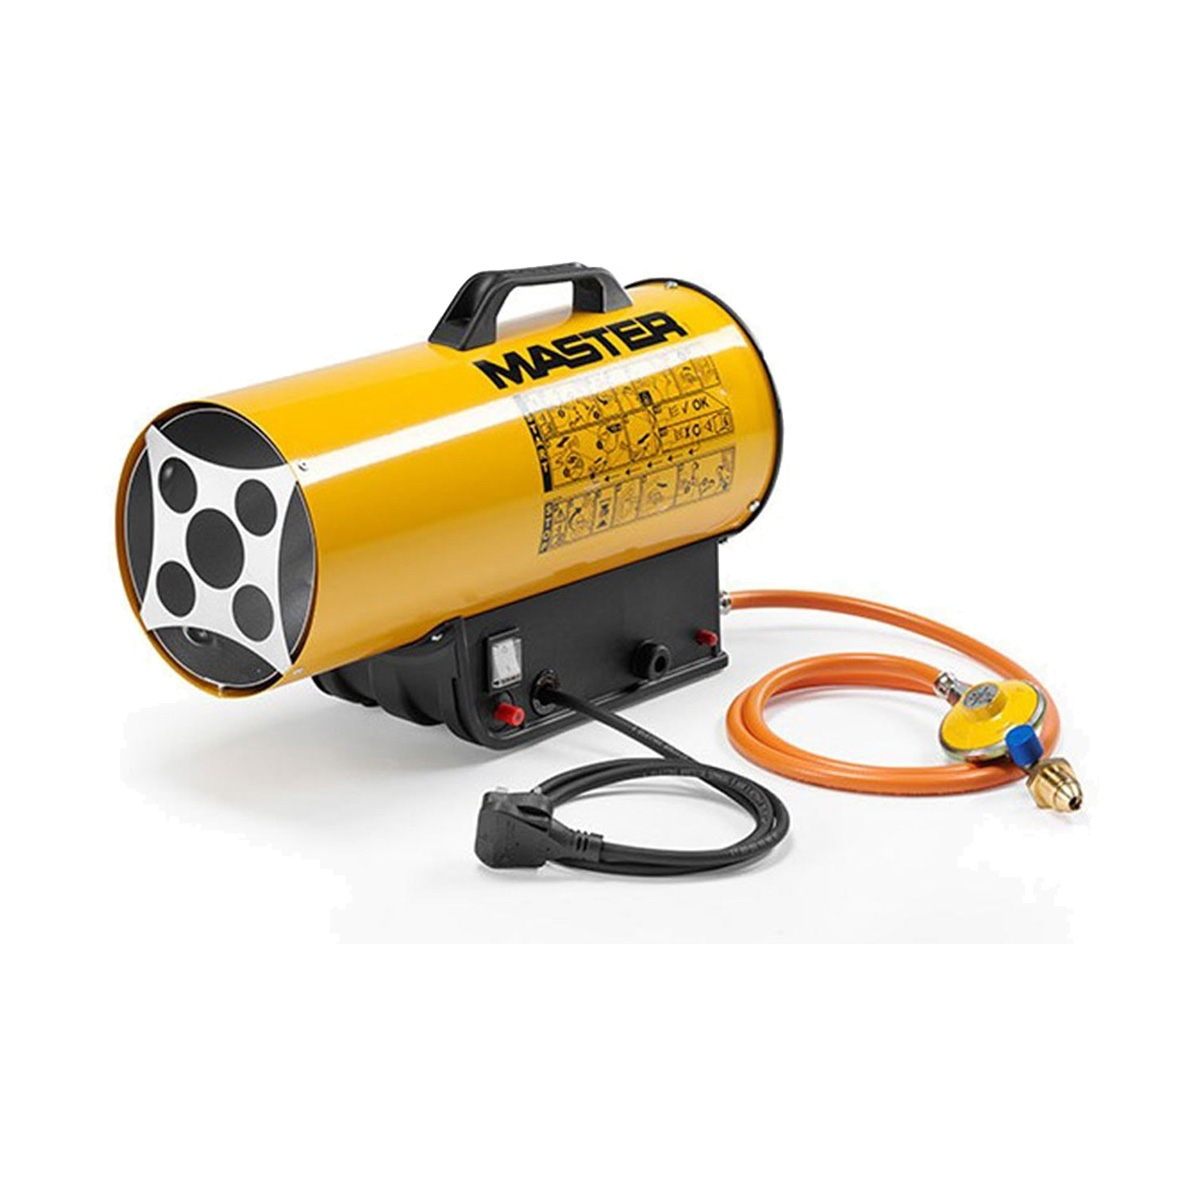 Image of Generatore aria calda a gas Master BLP 17M